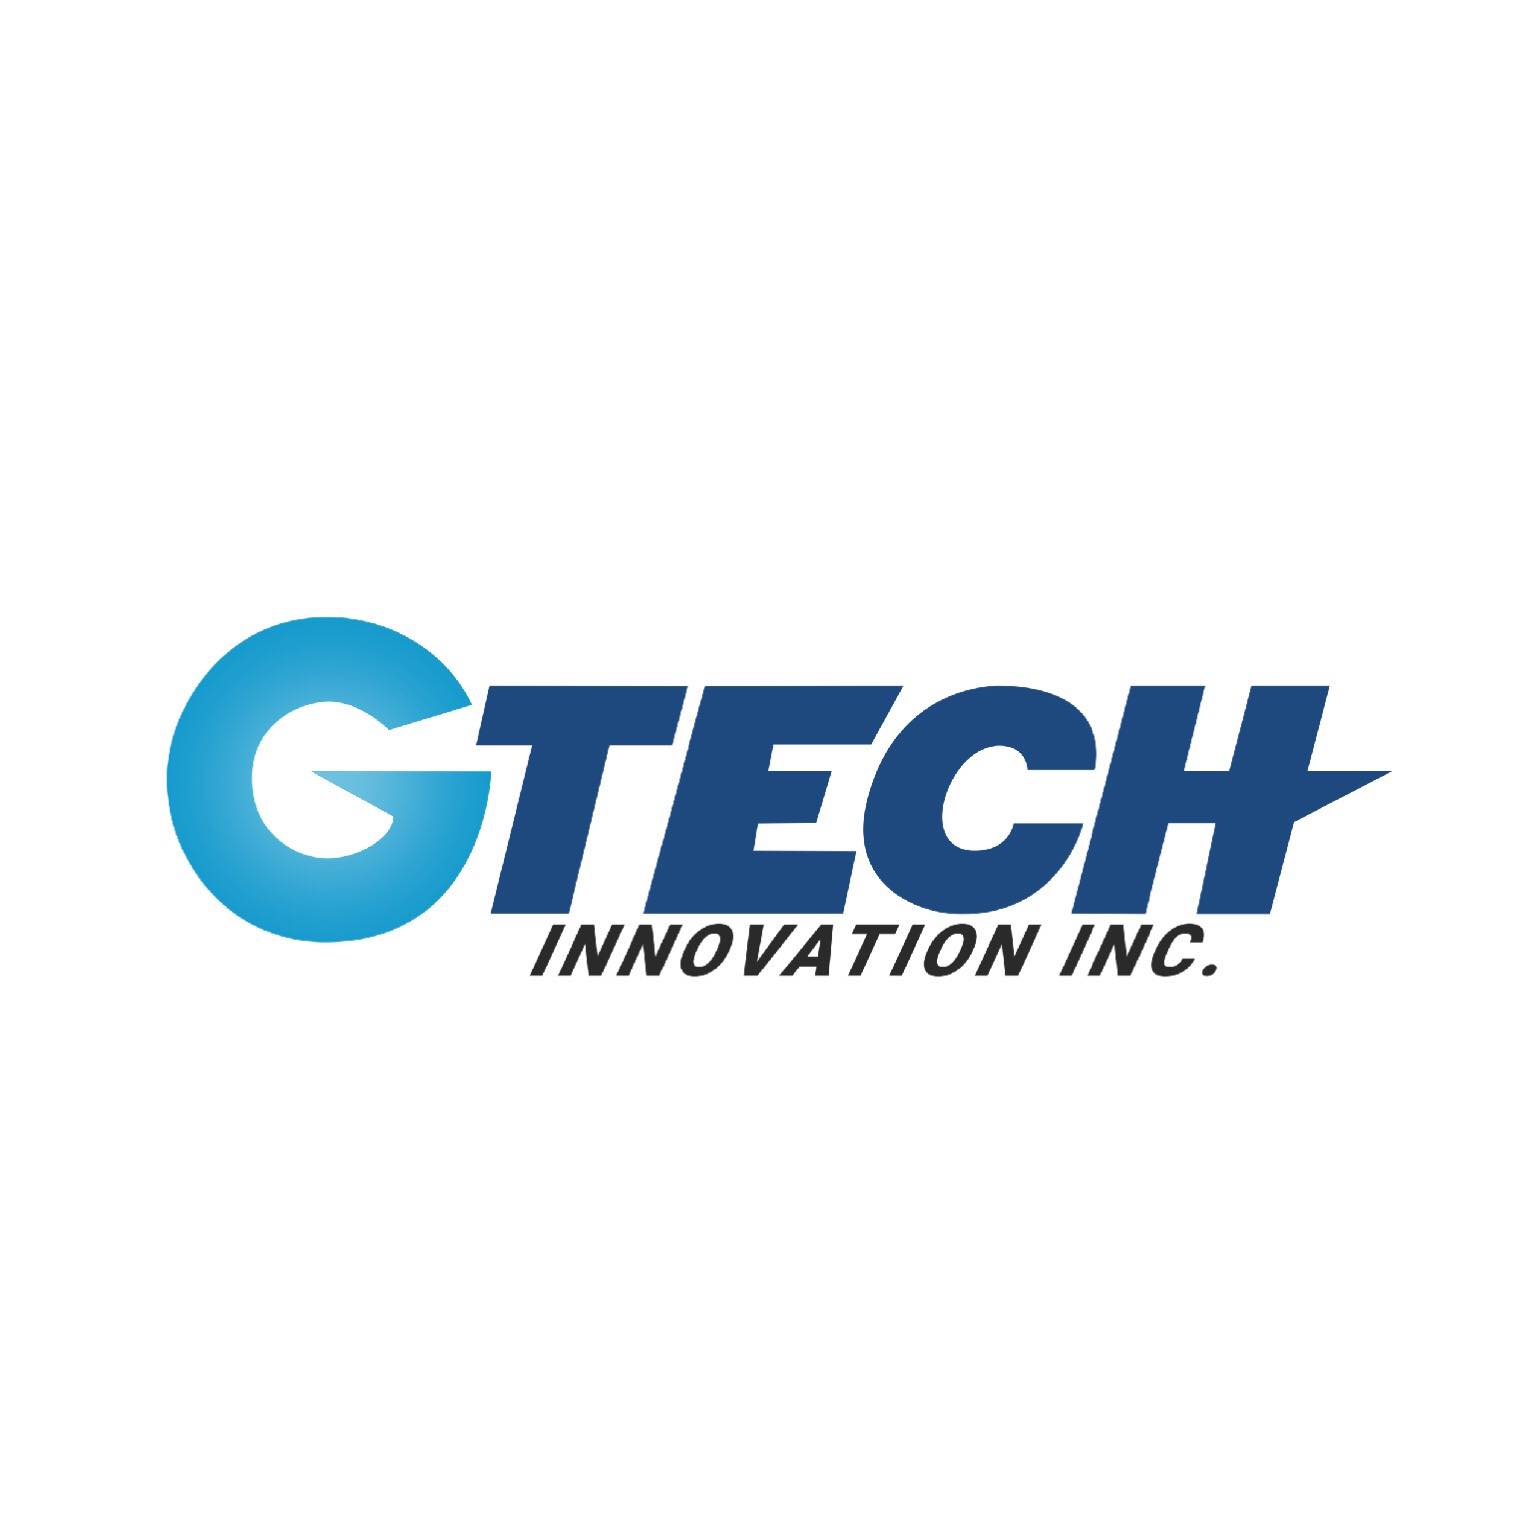 G-Tech Innovation, INC